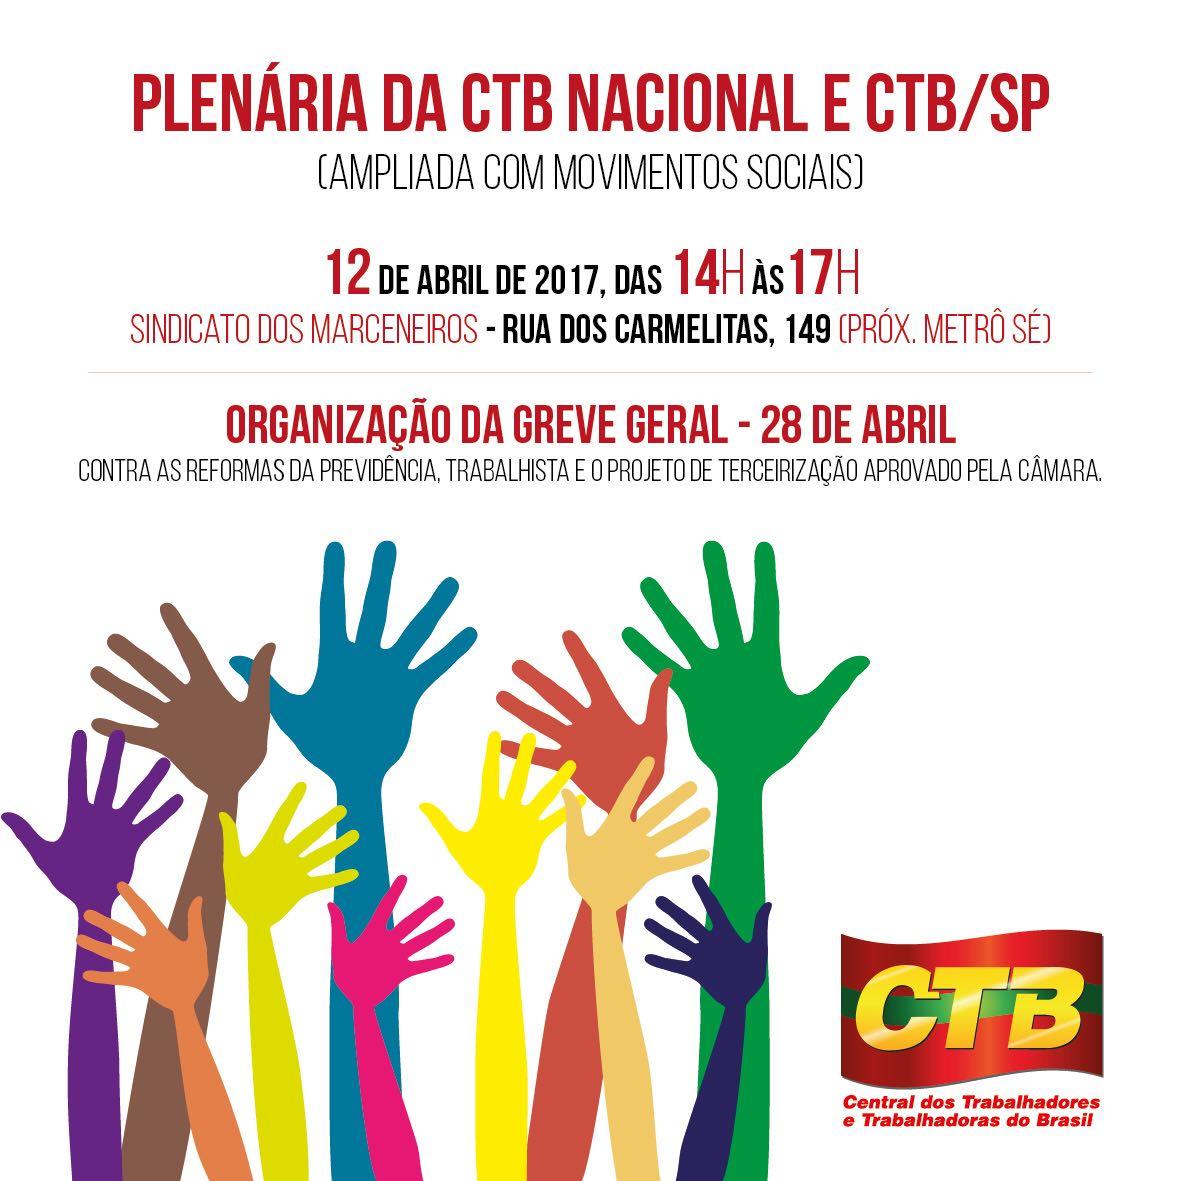 plenaria-ctbsp-nacional.jpg